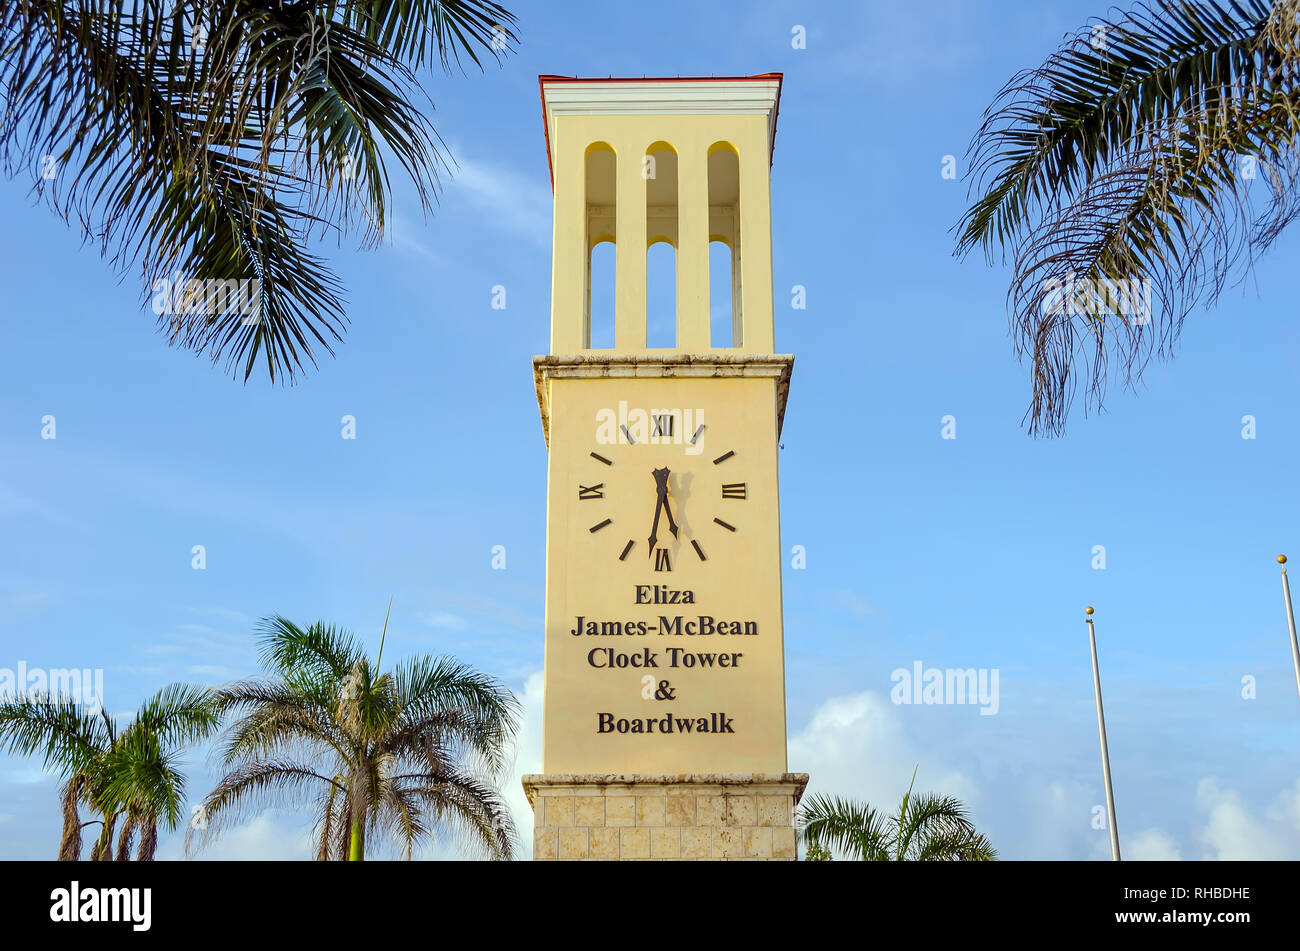 Eliza James-McBean Clock Tower Frederiksted Saint Croix U.S. Virgin Islands - Stock Image